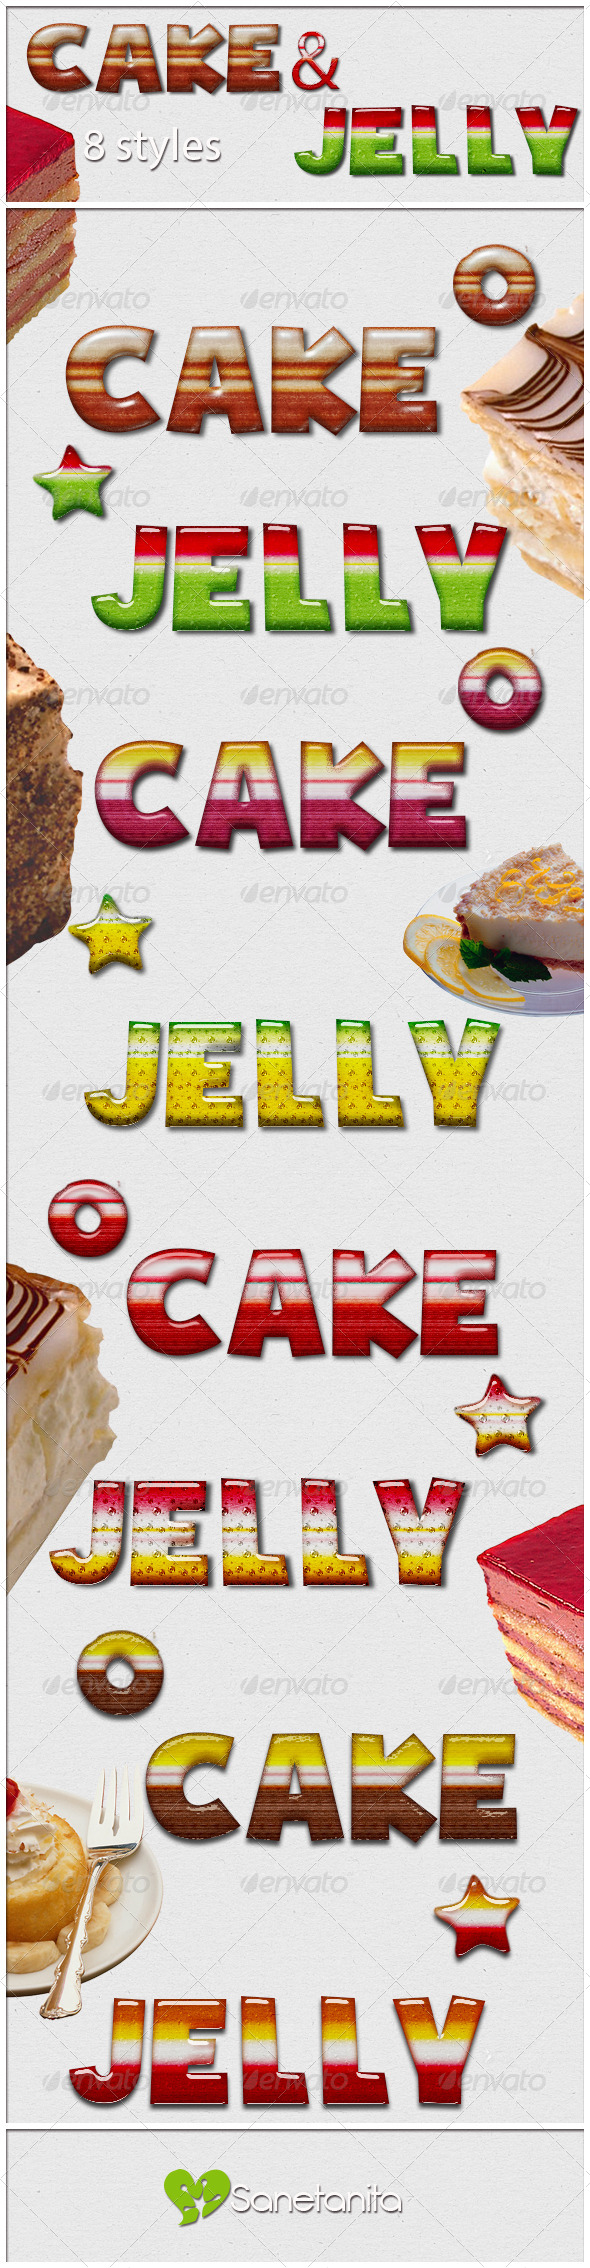 GraphicRiver 8 Dessert Styles 8688994